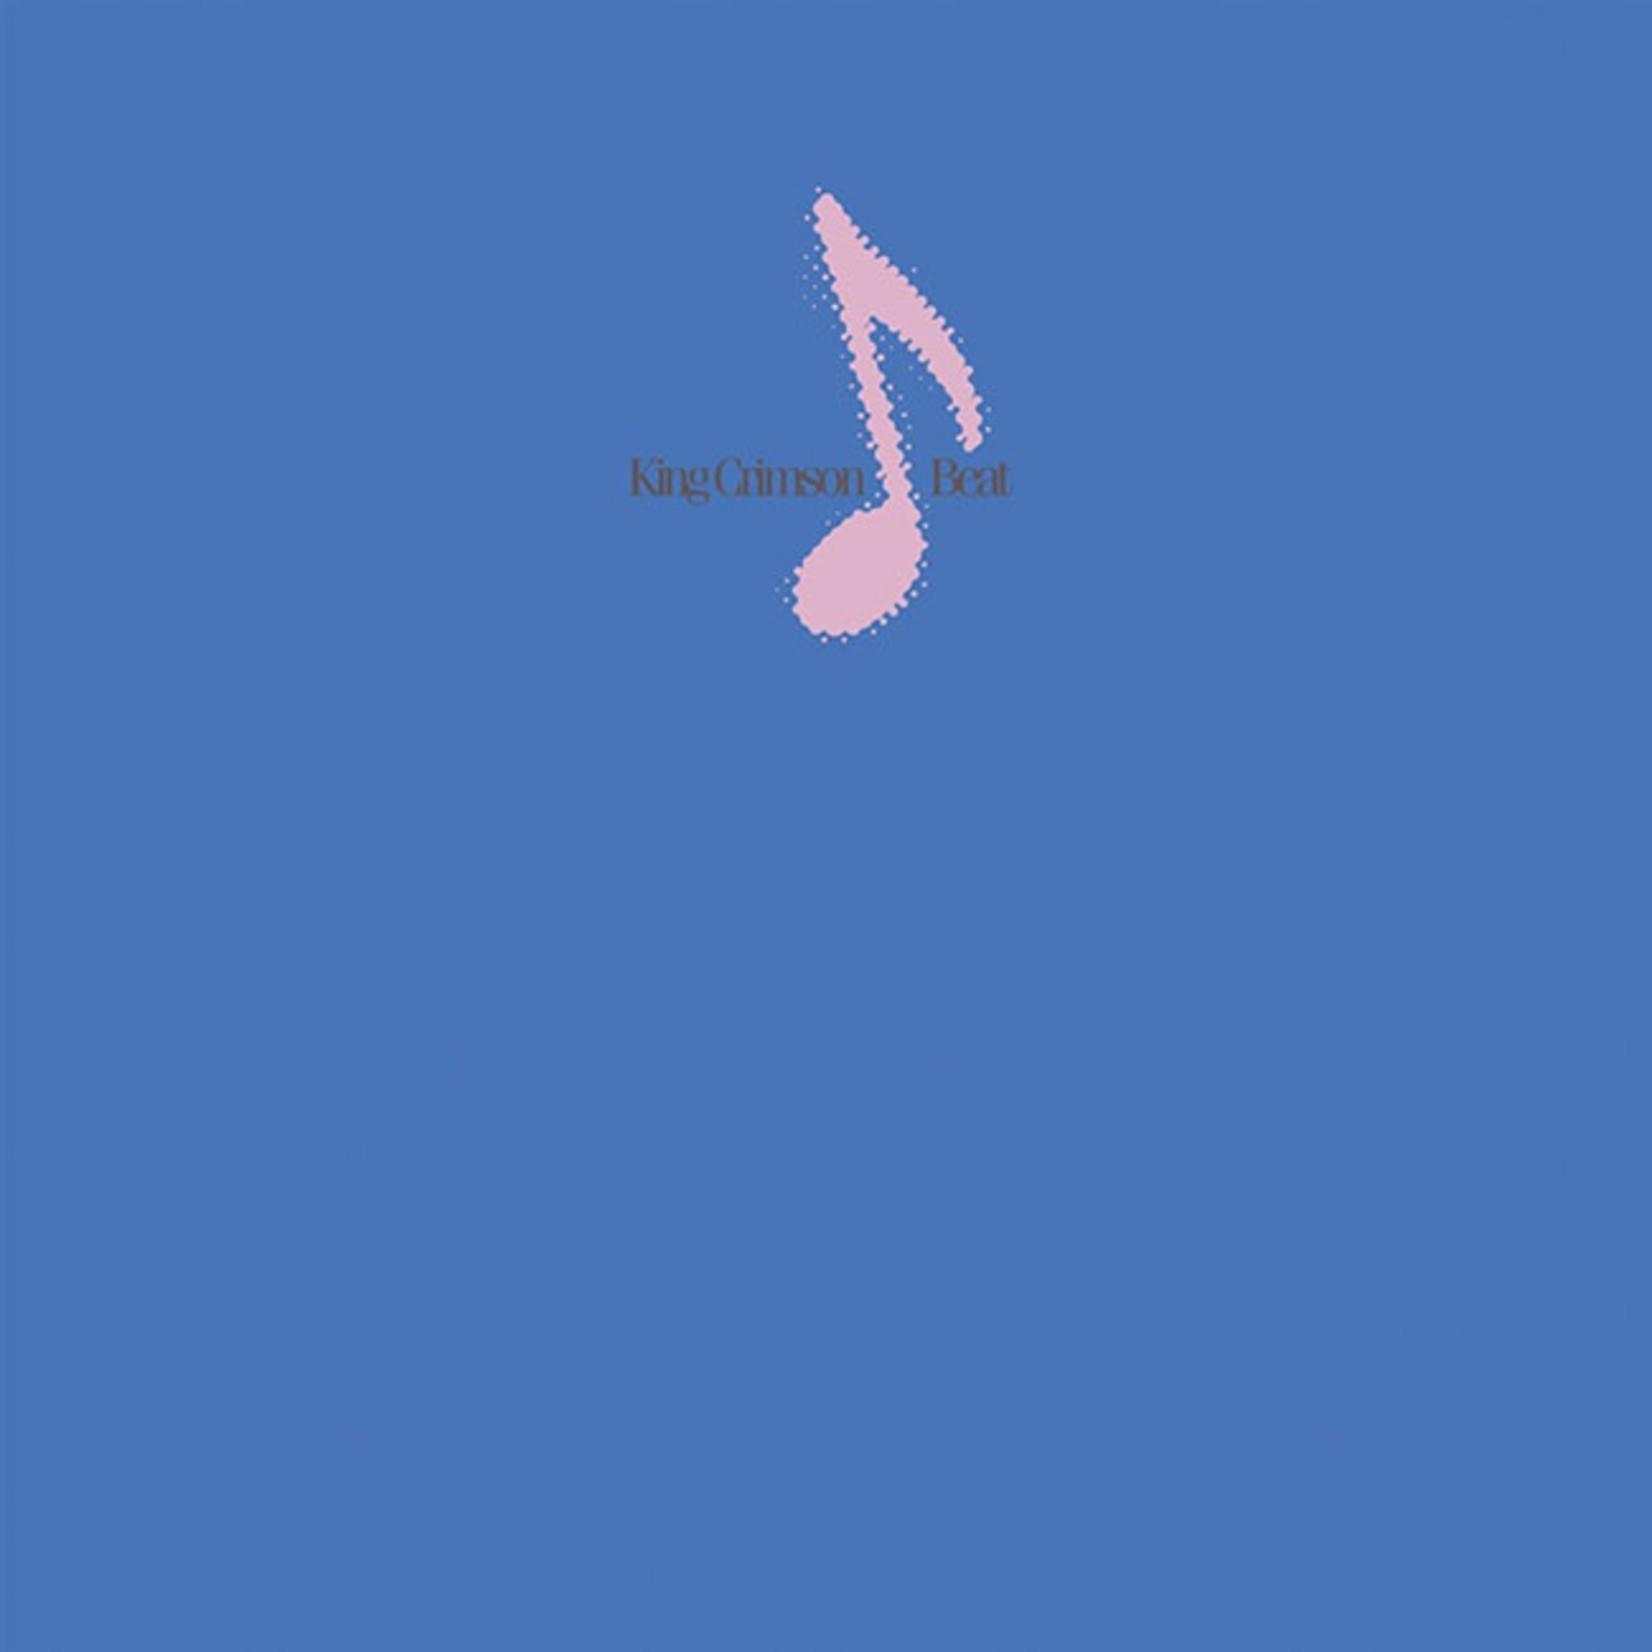 [New] King Crimson: Beat (200g)